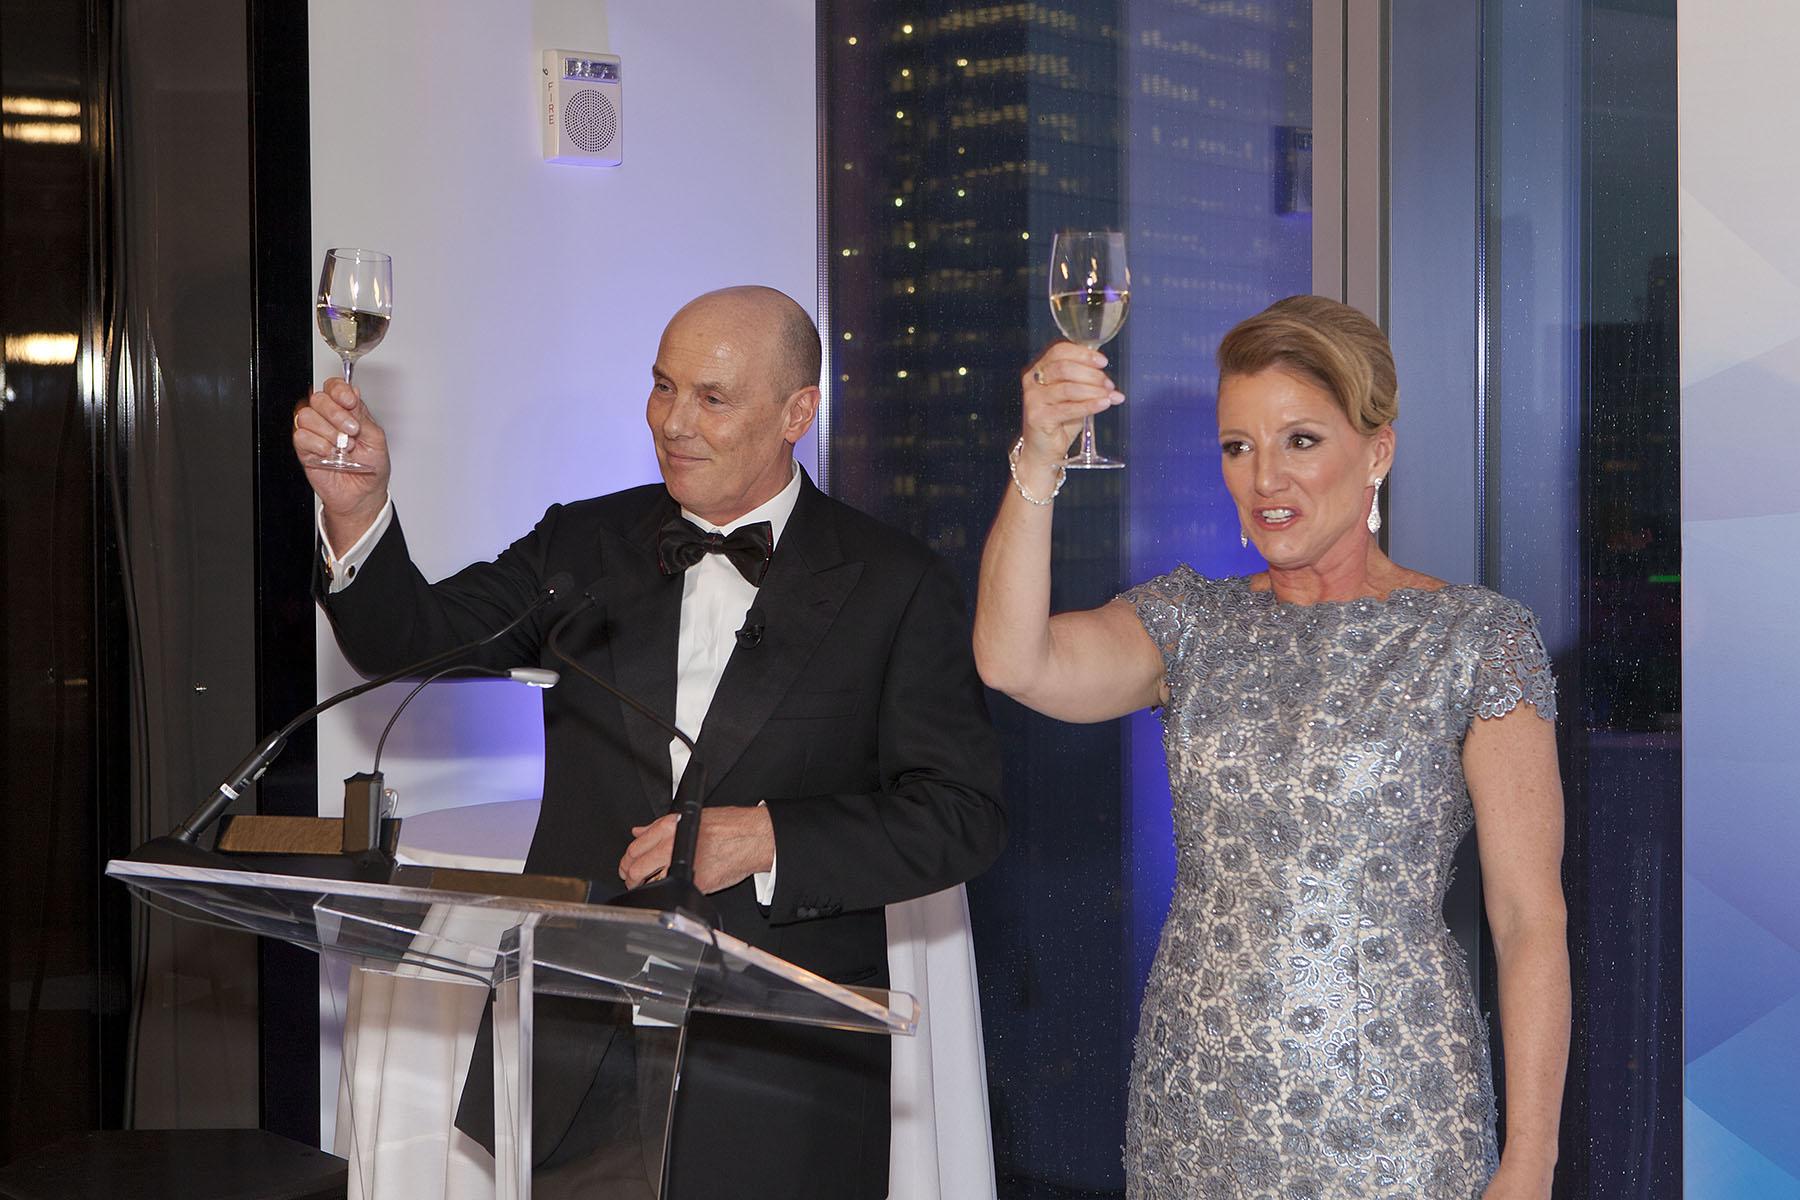 Avon EVP John Higson, CEO Sheri McCoy